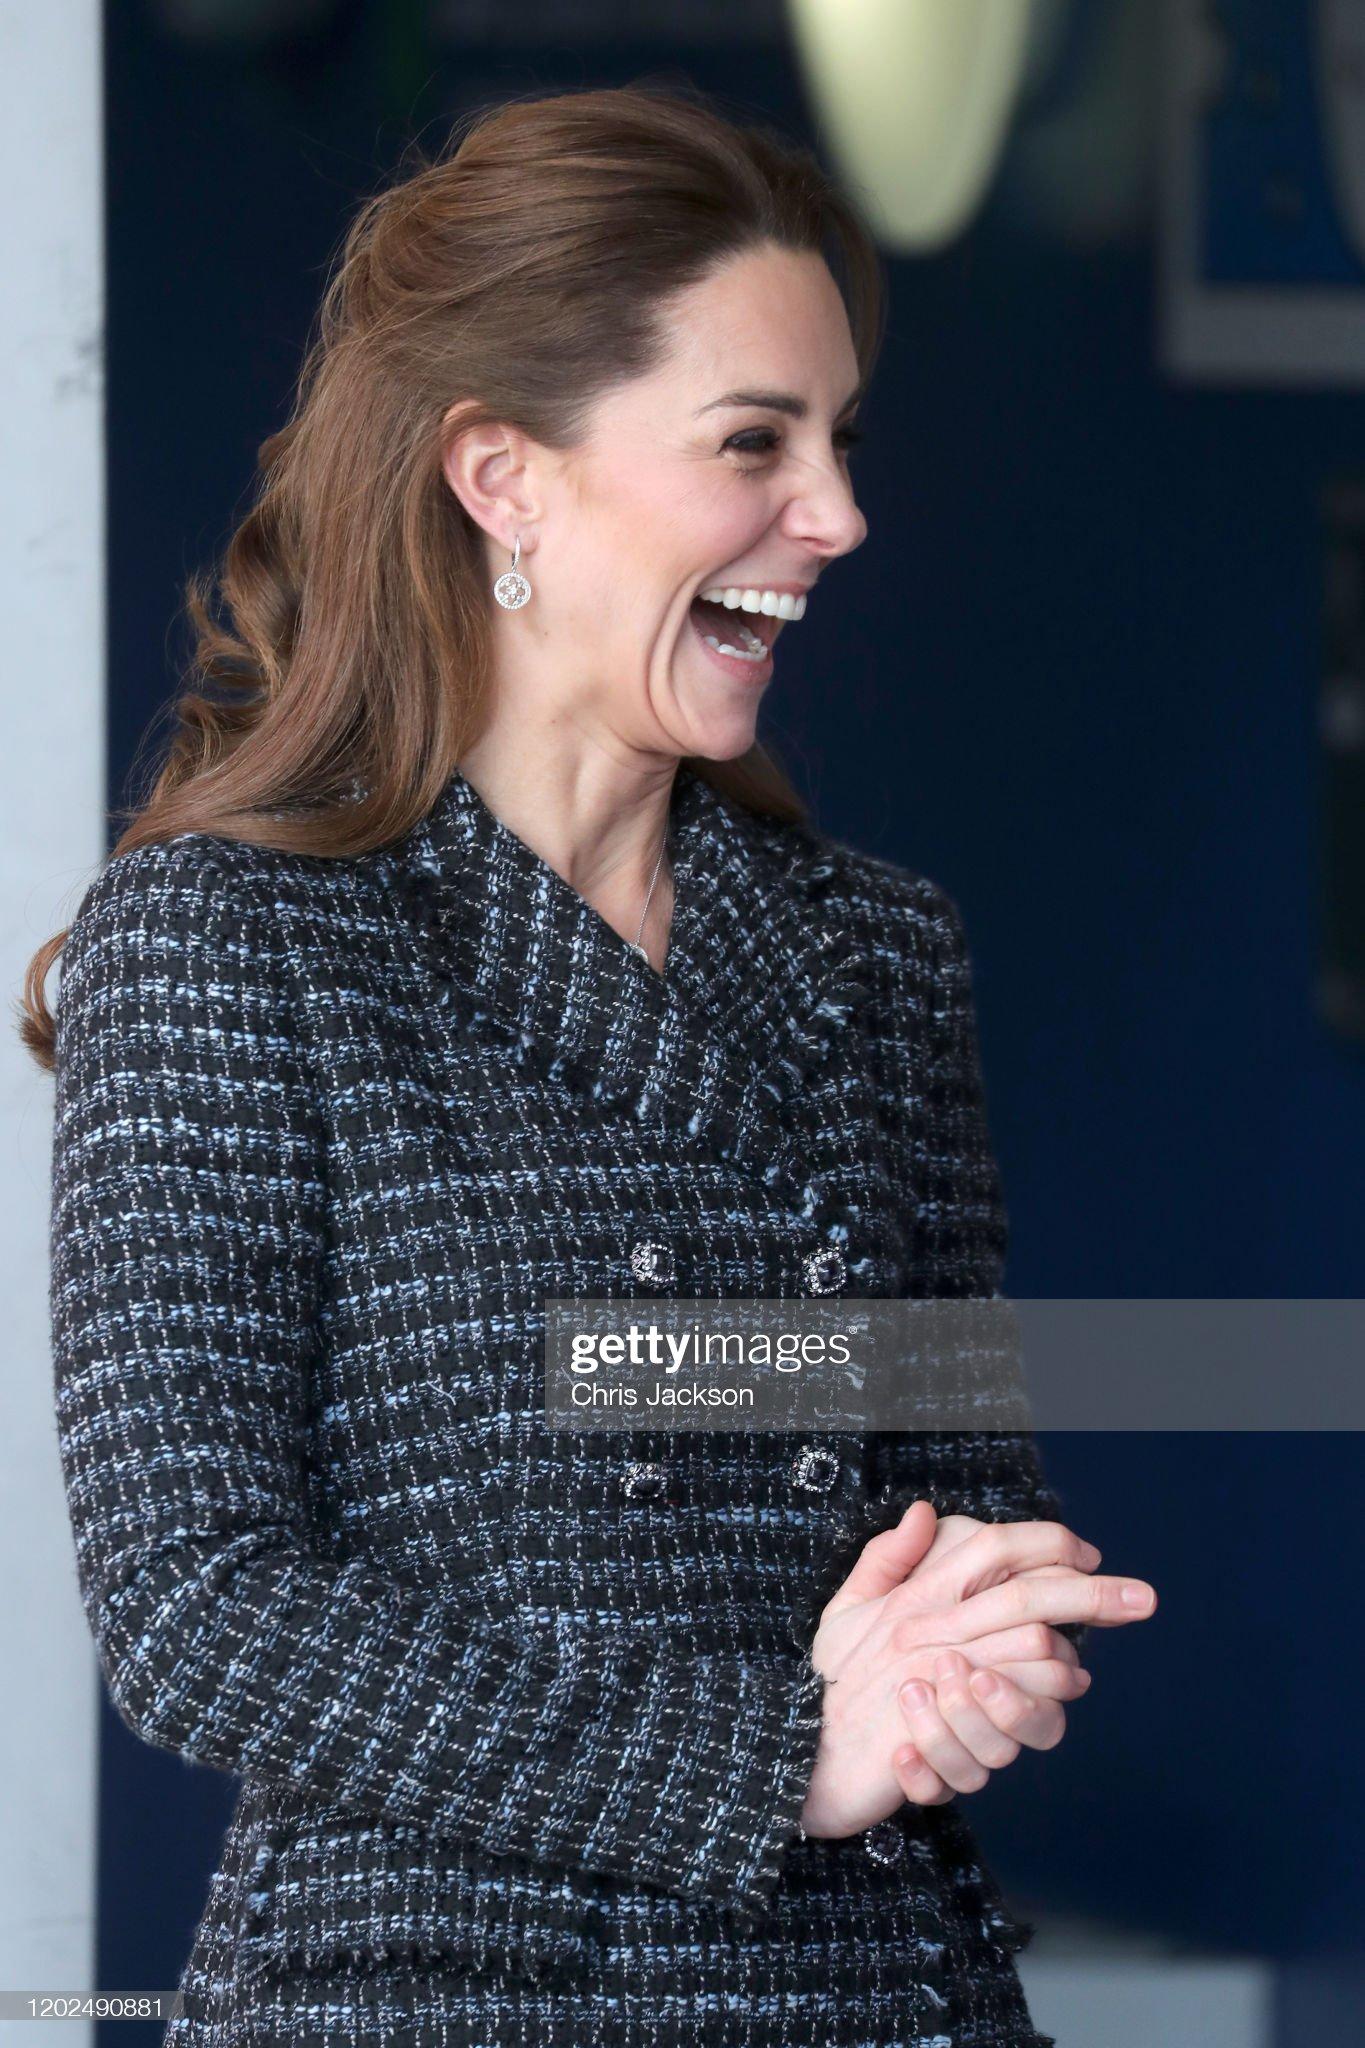 Мероприятие герцогини Кембриджской. Обновлен